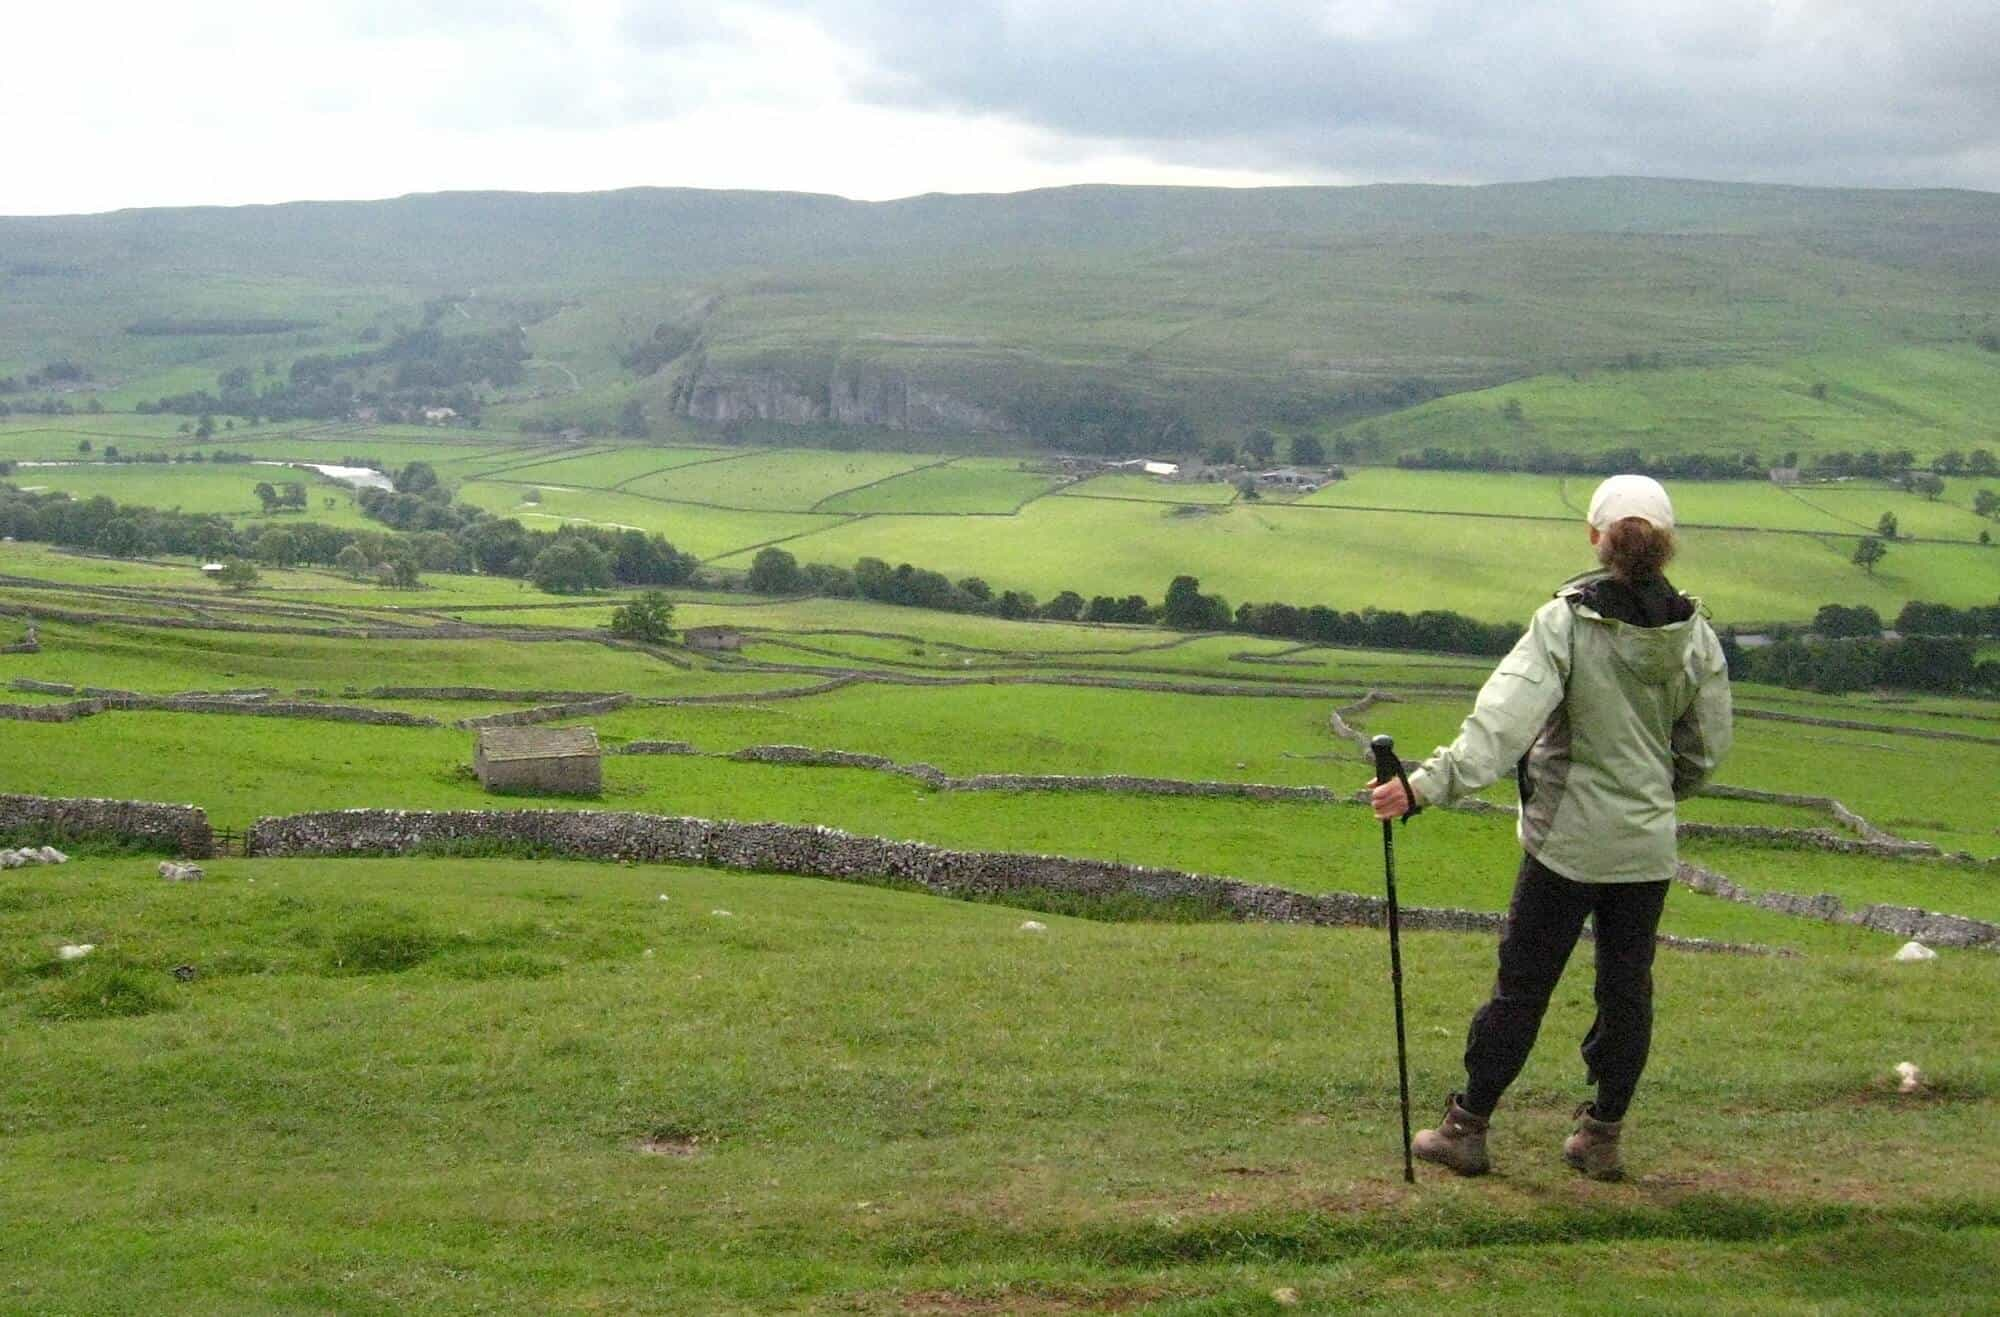 Walking the Dales Way